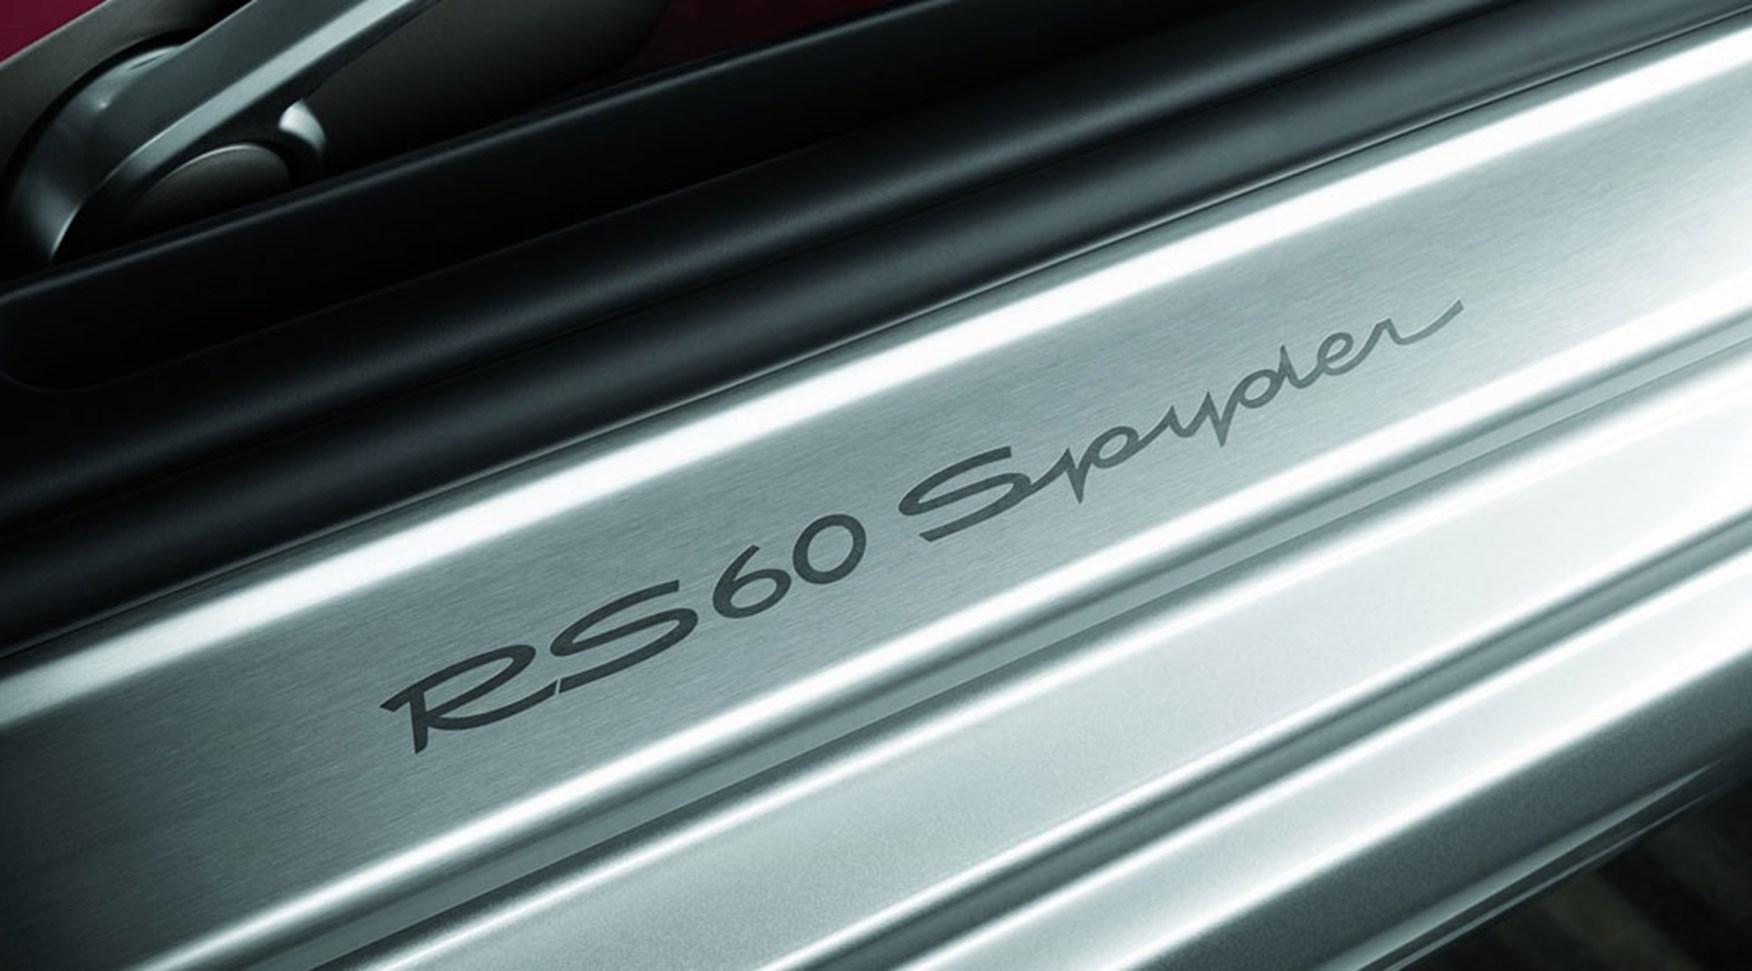 Porsche Boxster Rs 60 Spyder 2008 Review Car Magazine